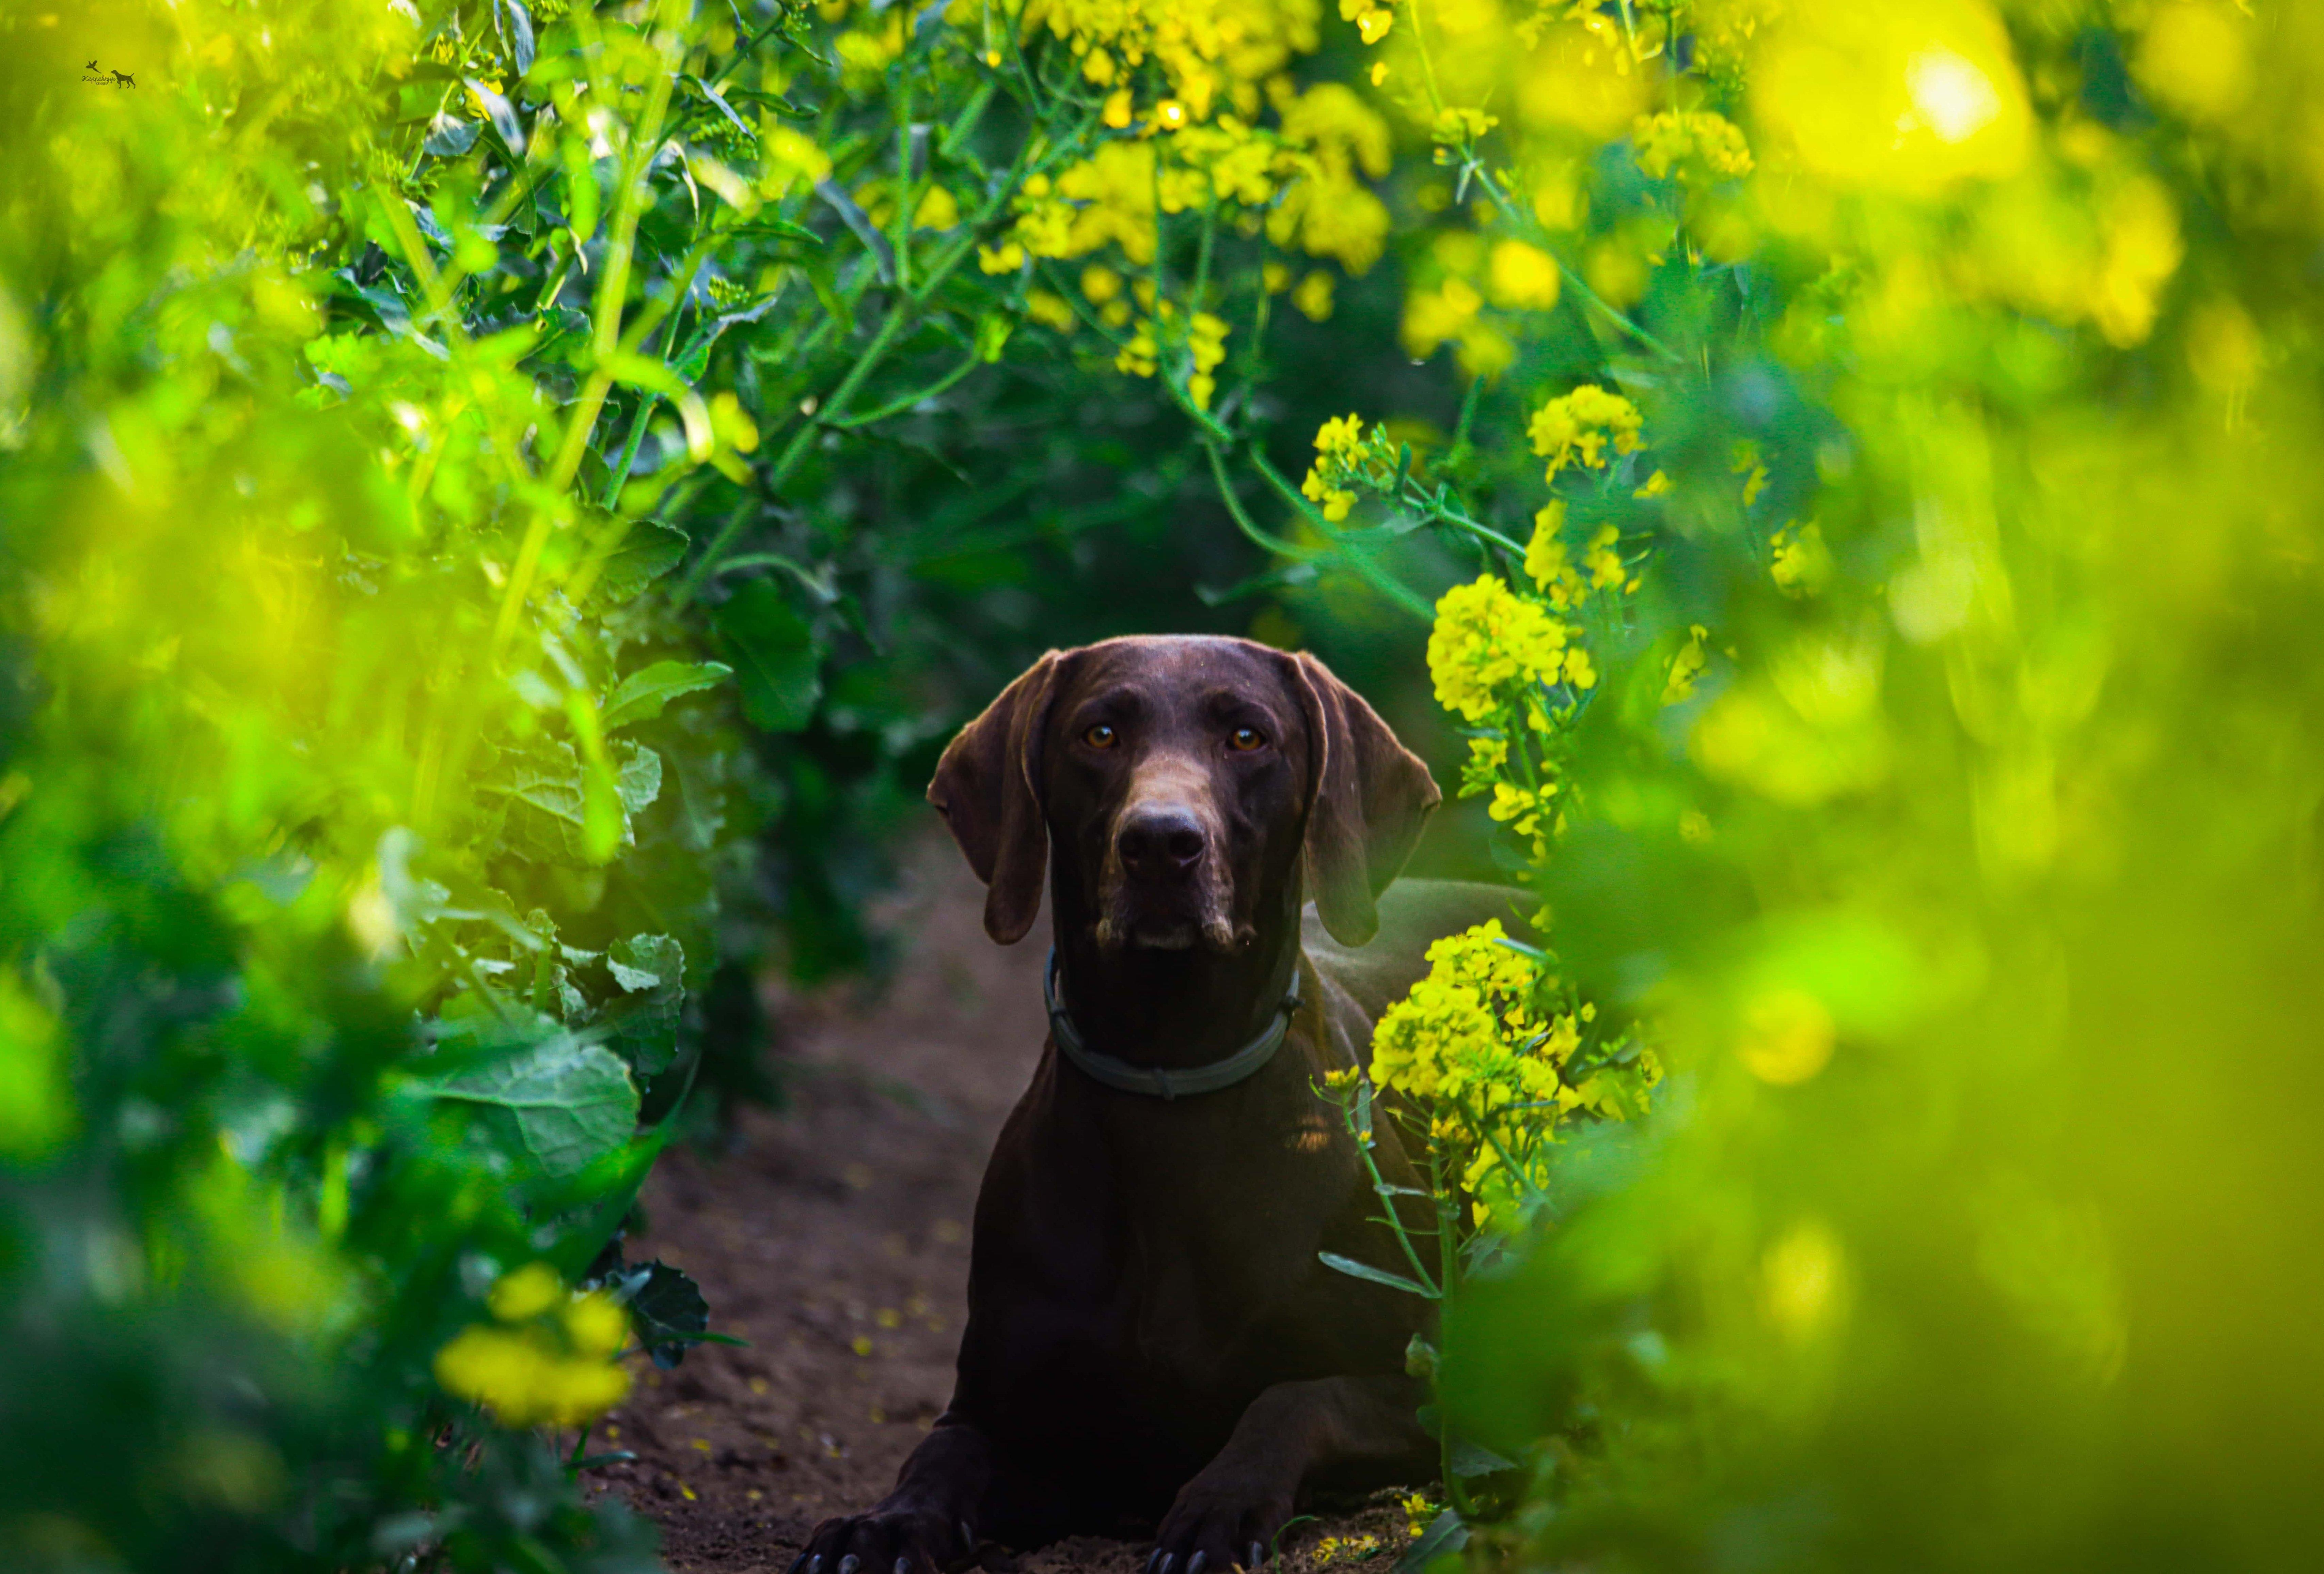 Barna kutya a virágos ösvényen